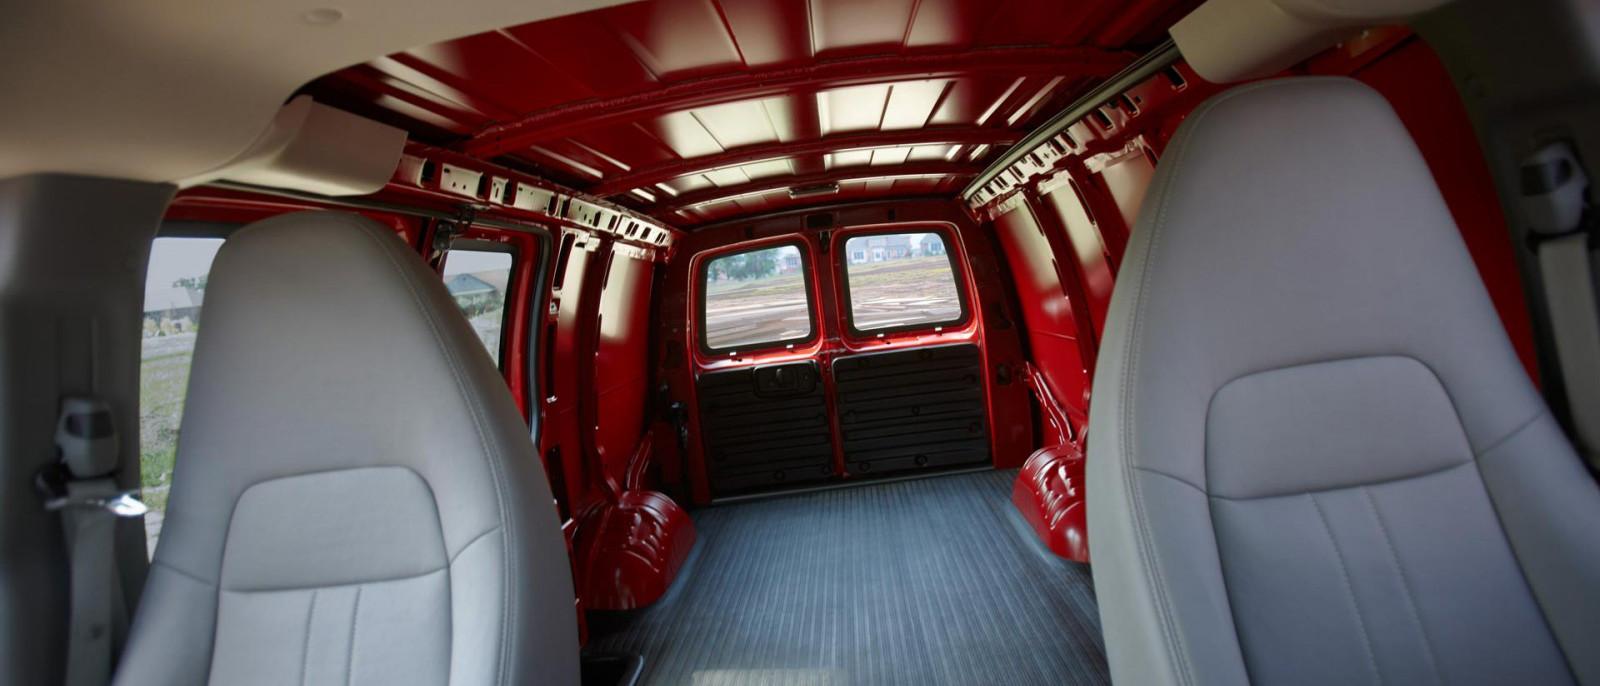 2015 Chevy Express Cargo Van interior